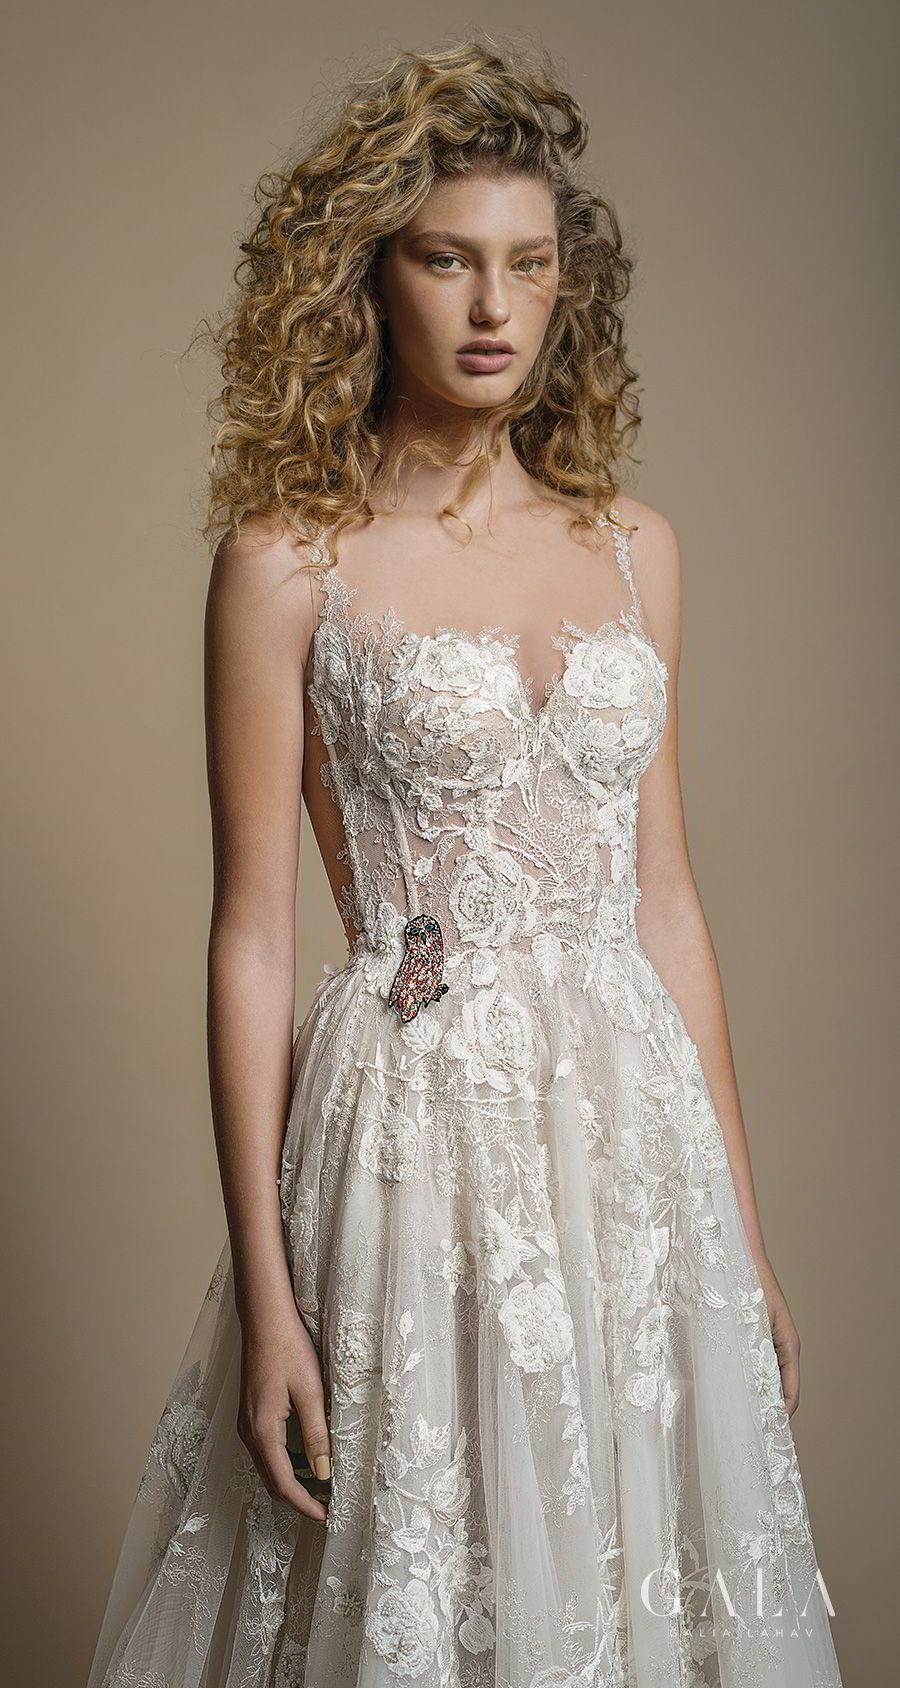 GALA by Galia Lahav Collection No VI  These Wedding Dresses are the Stuff of Dreams  Wedding